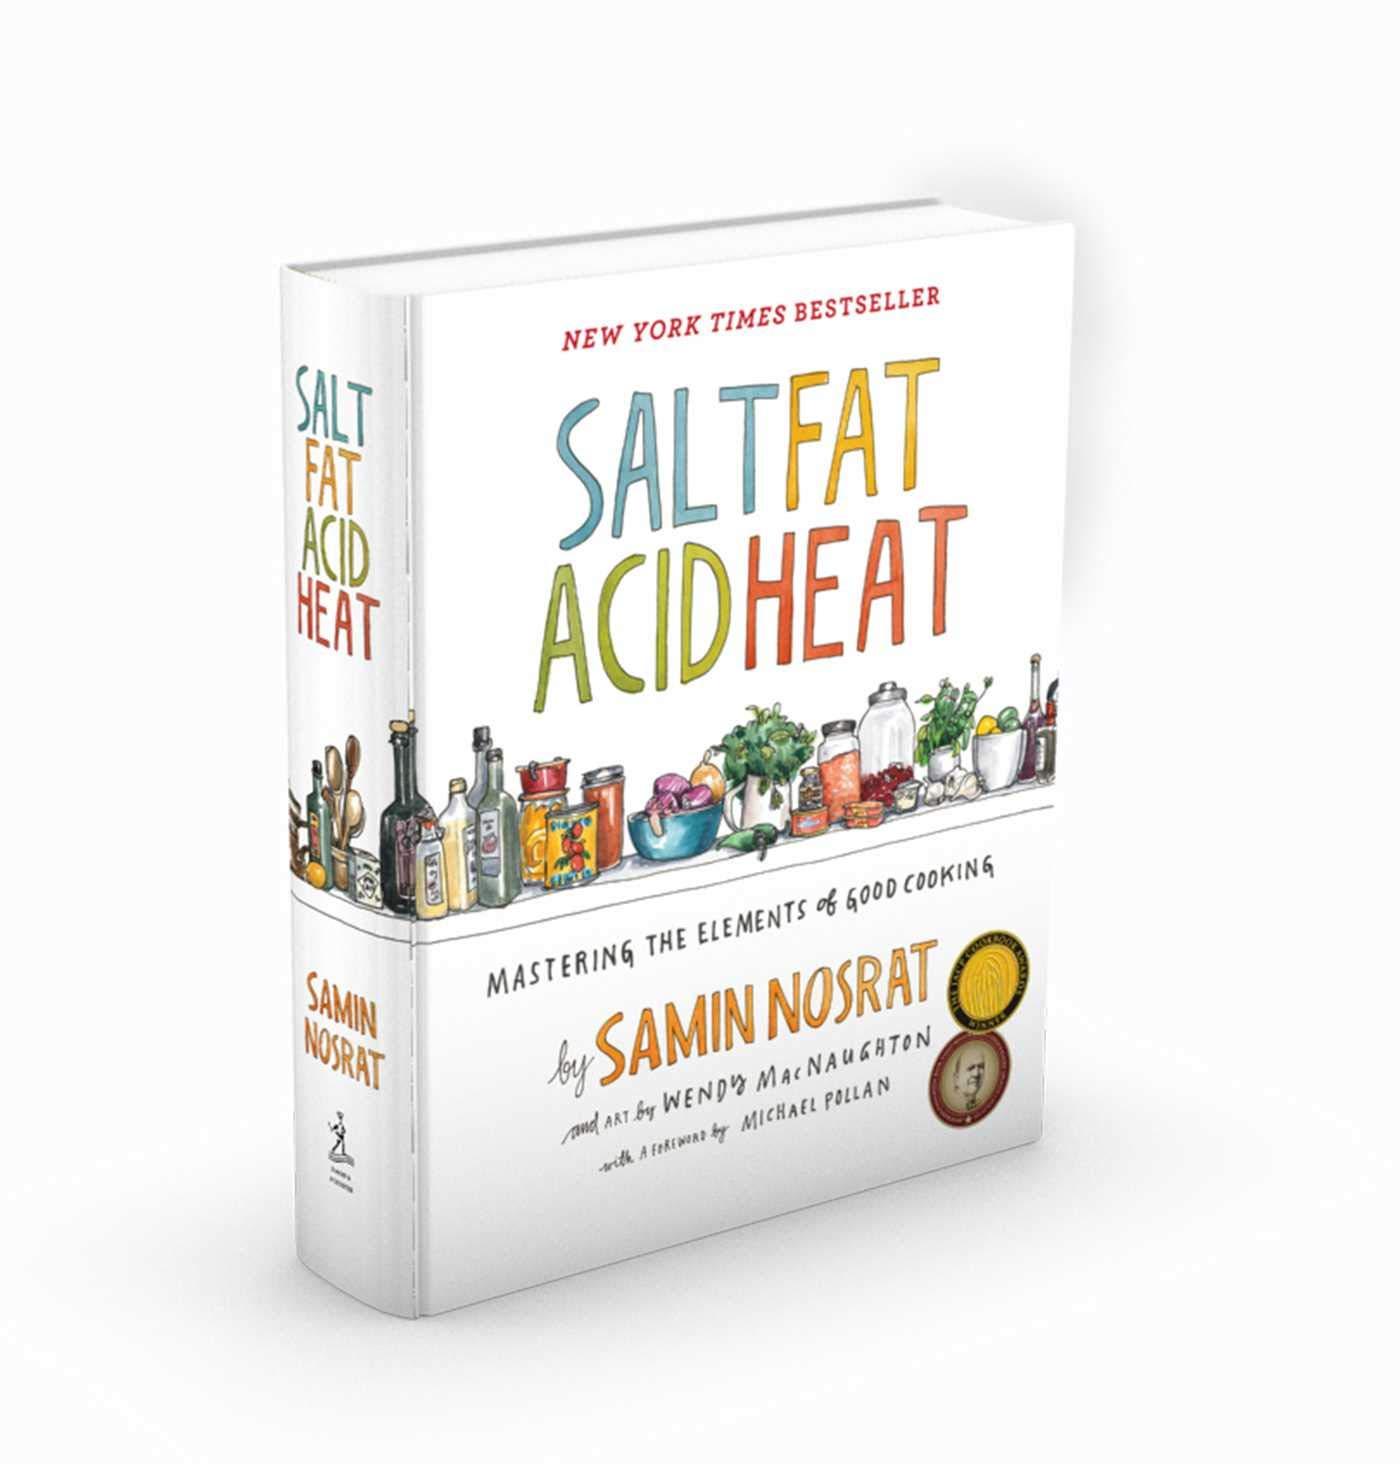 Salt Fat Acid Heat book by Samin Nosrat